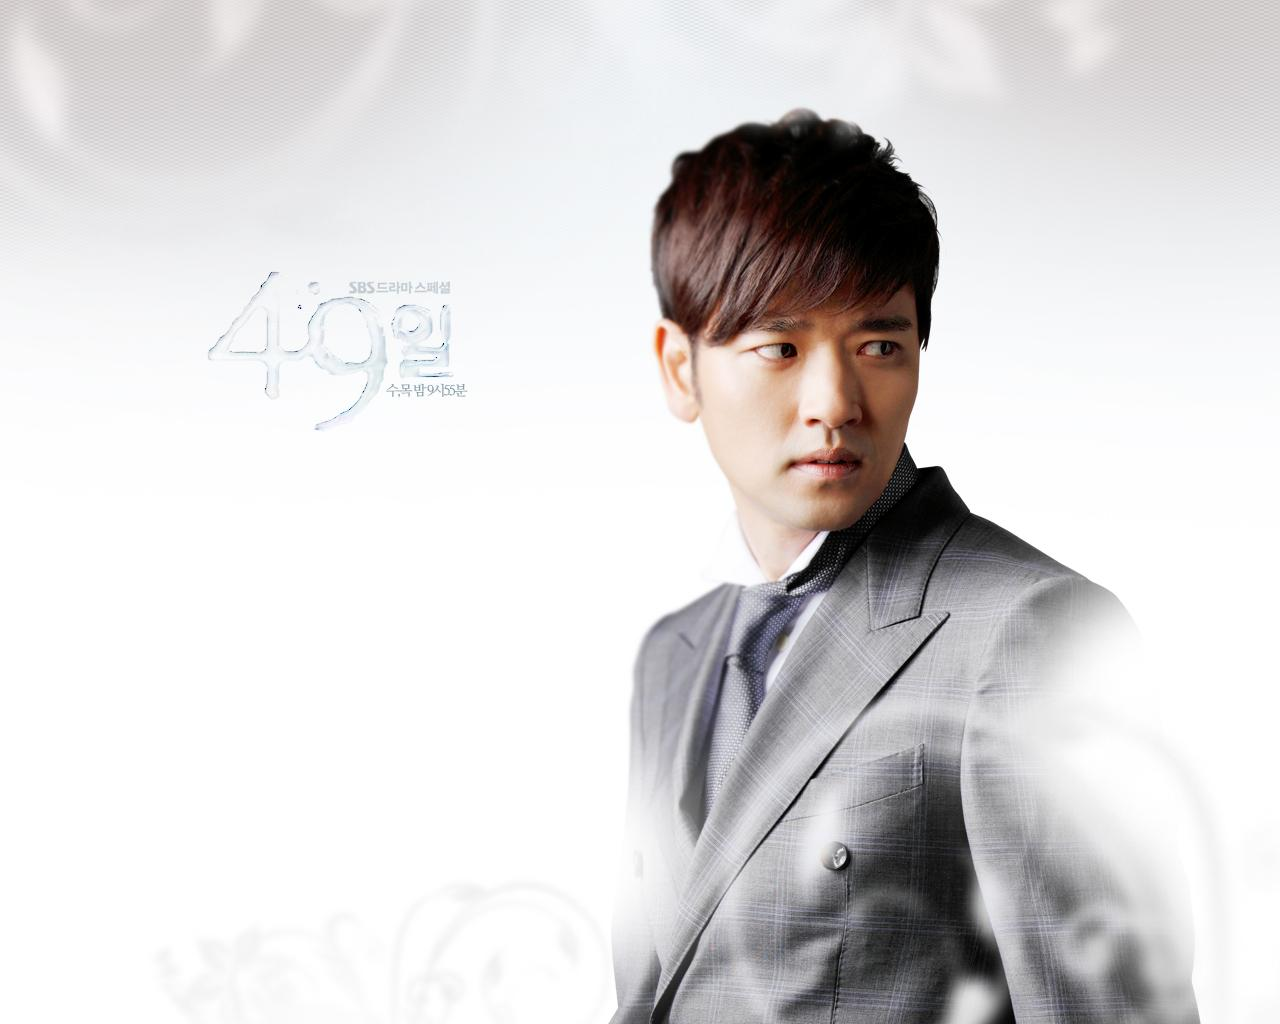 http://korean-cute.sosugary.com/albums/userpics/10001/163.jpg